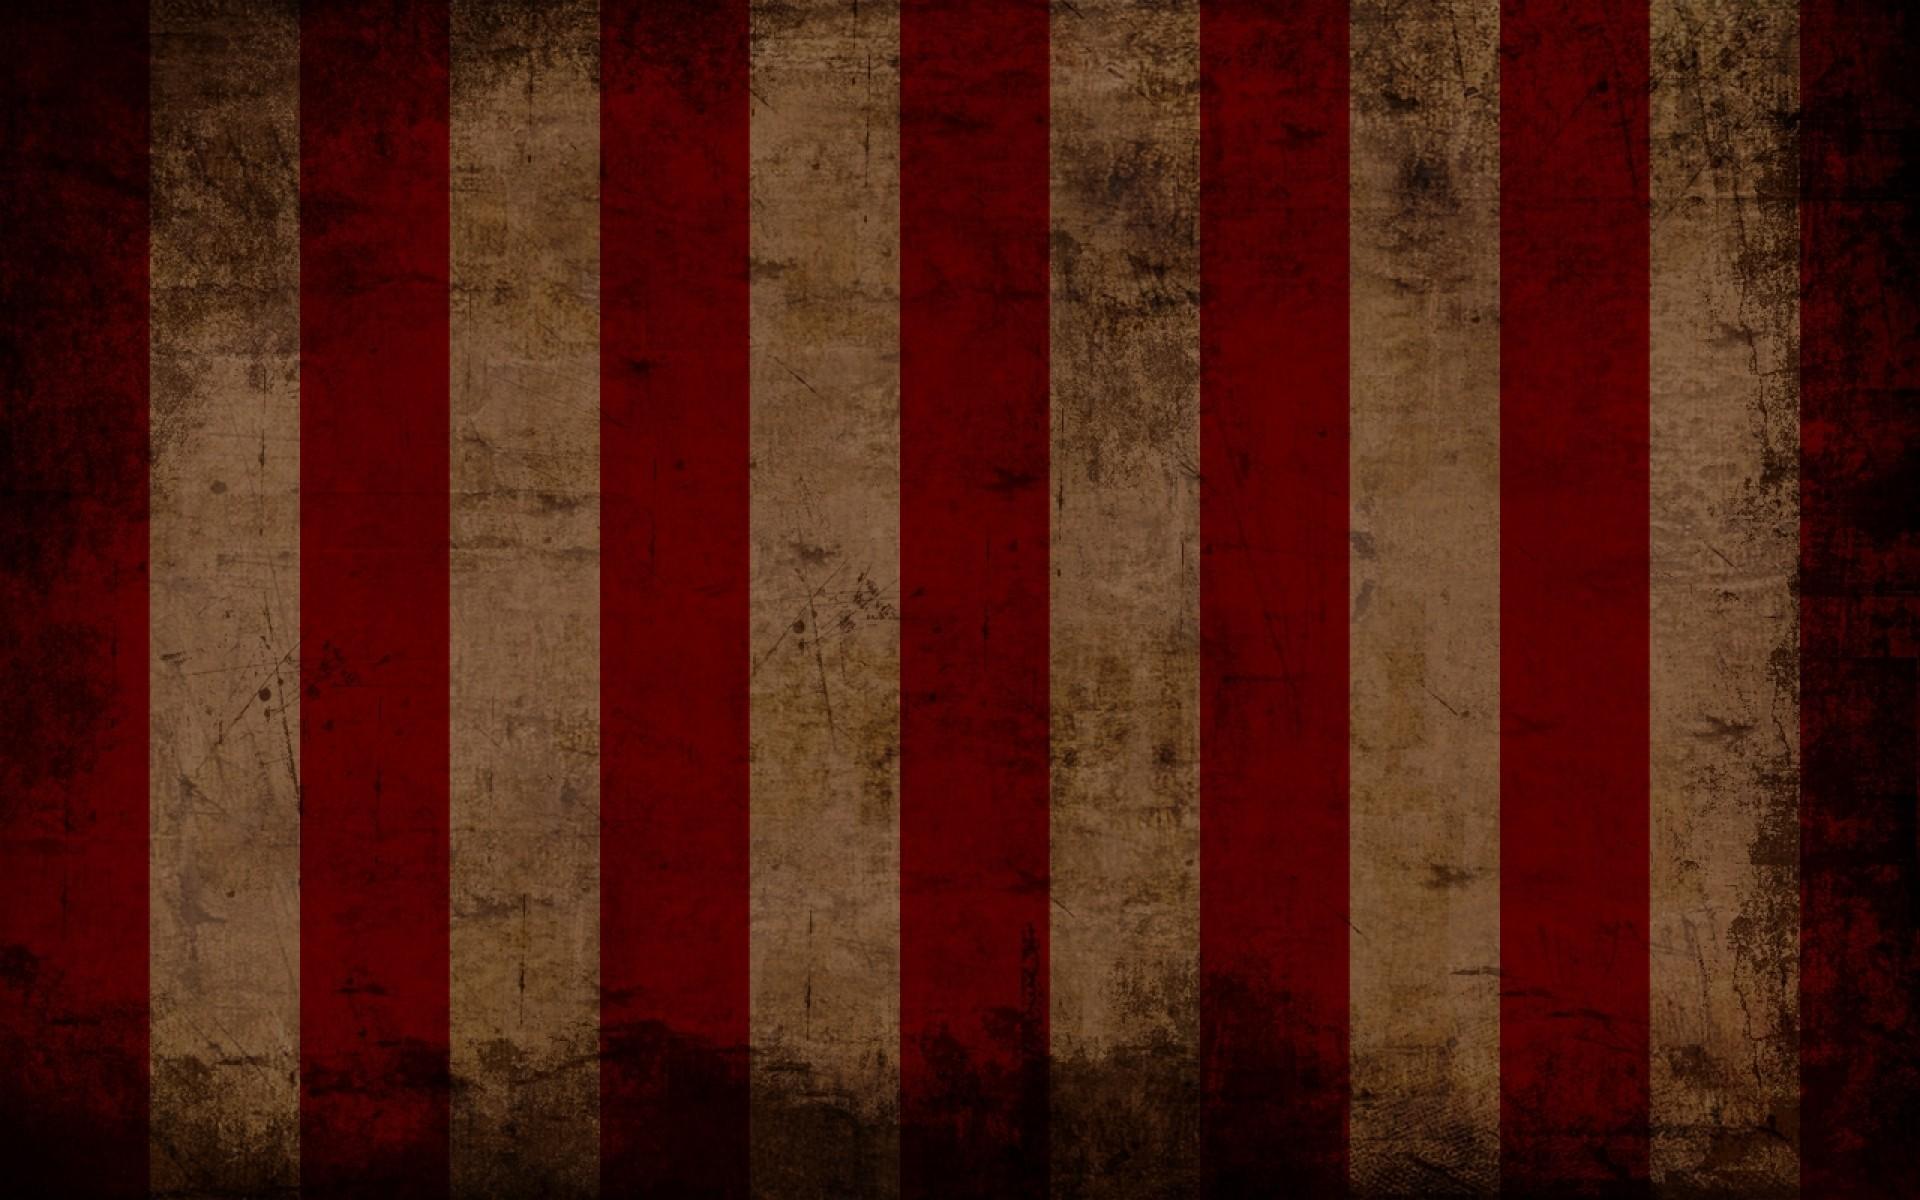 grunge backgrounds stripes 1280×800 wallpaper High Resolution Wallpaper